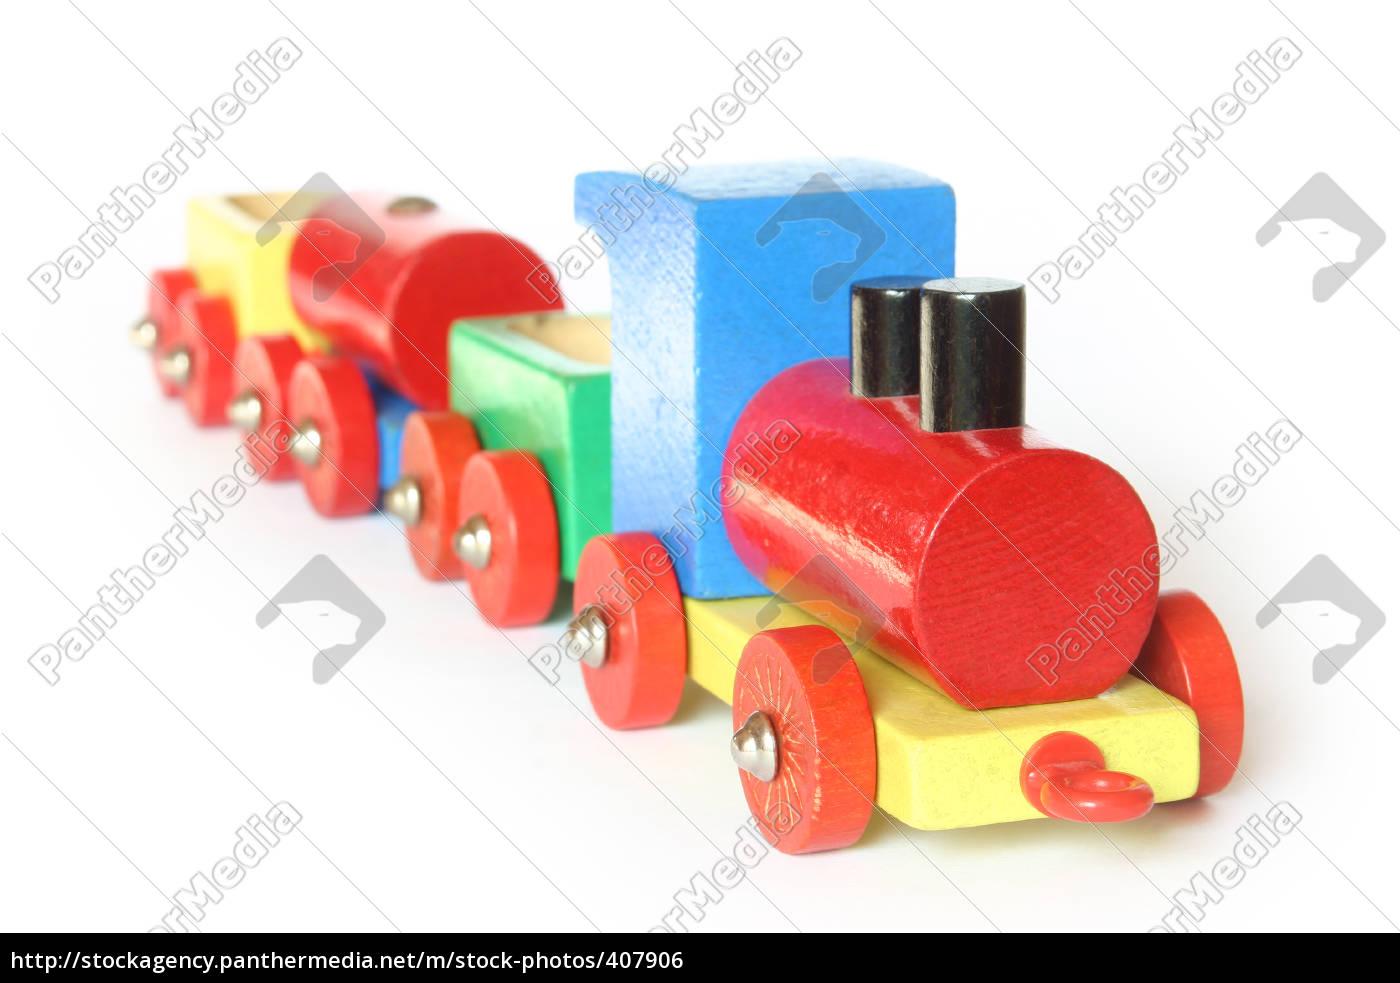 kids, wooden, train - 407906